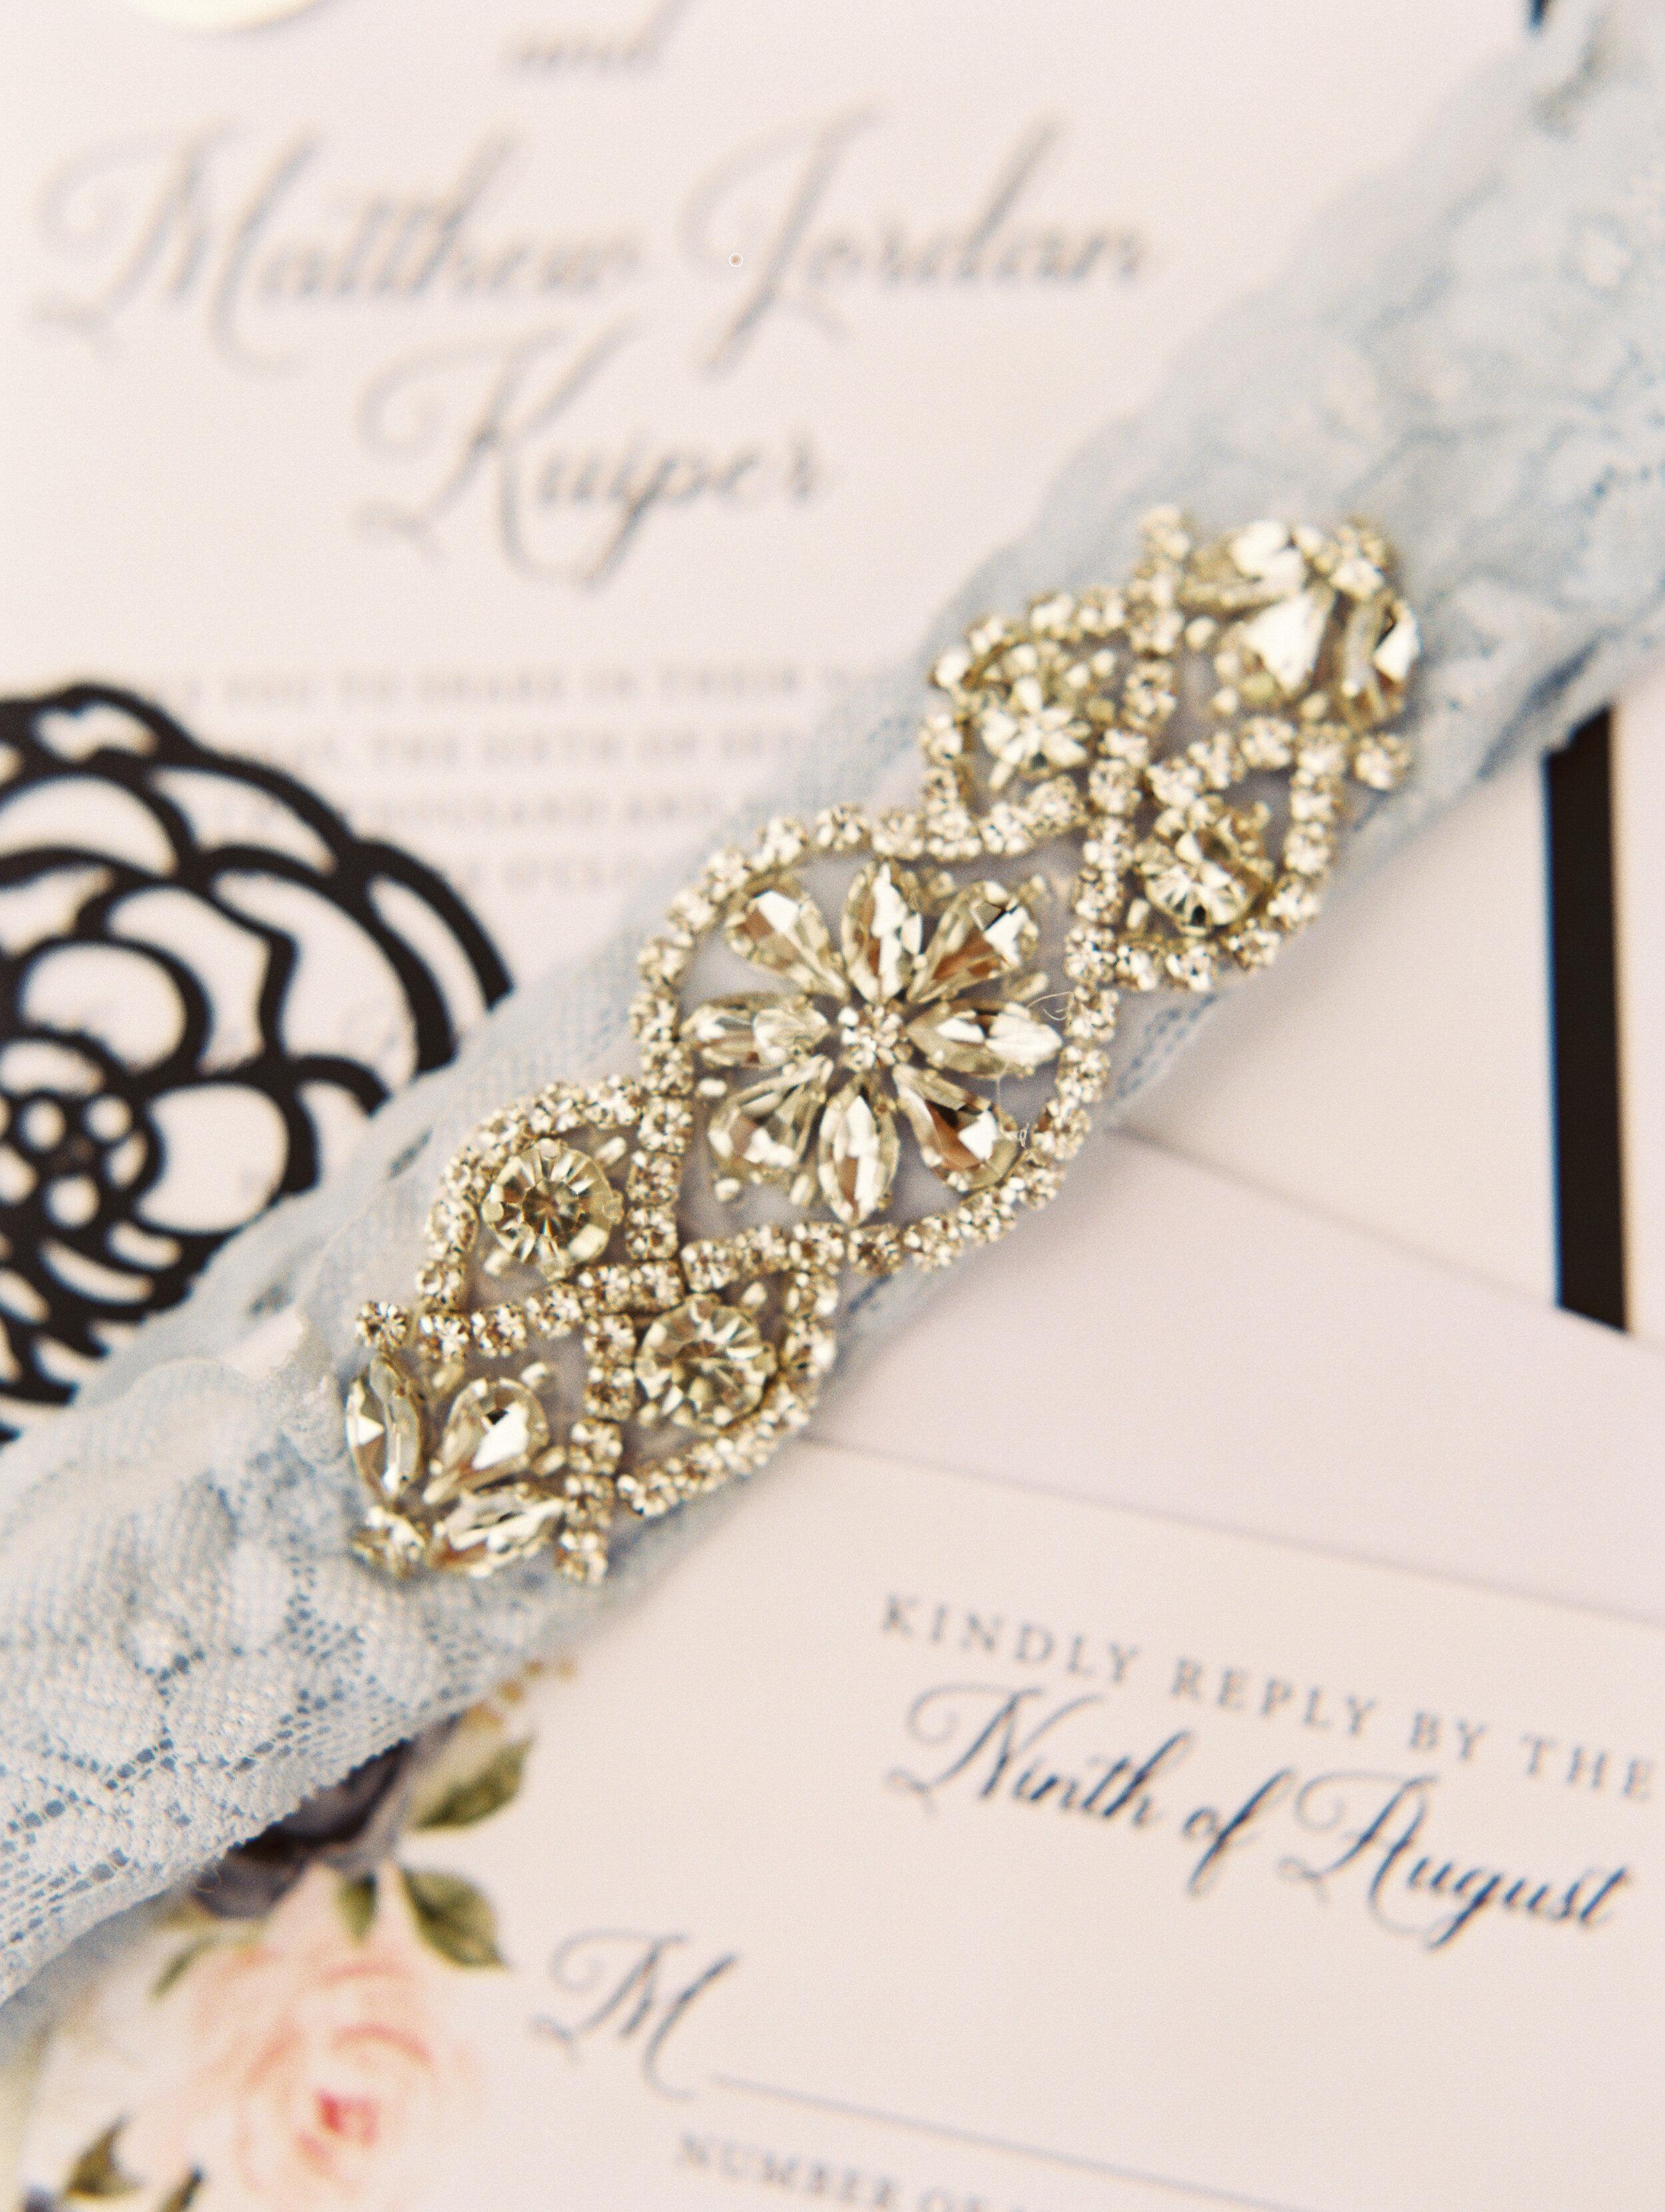 Kuiper+Wedding+Details-75.jpg